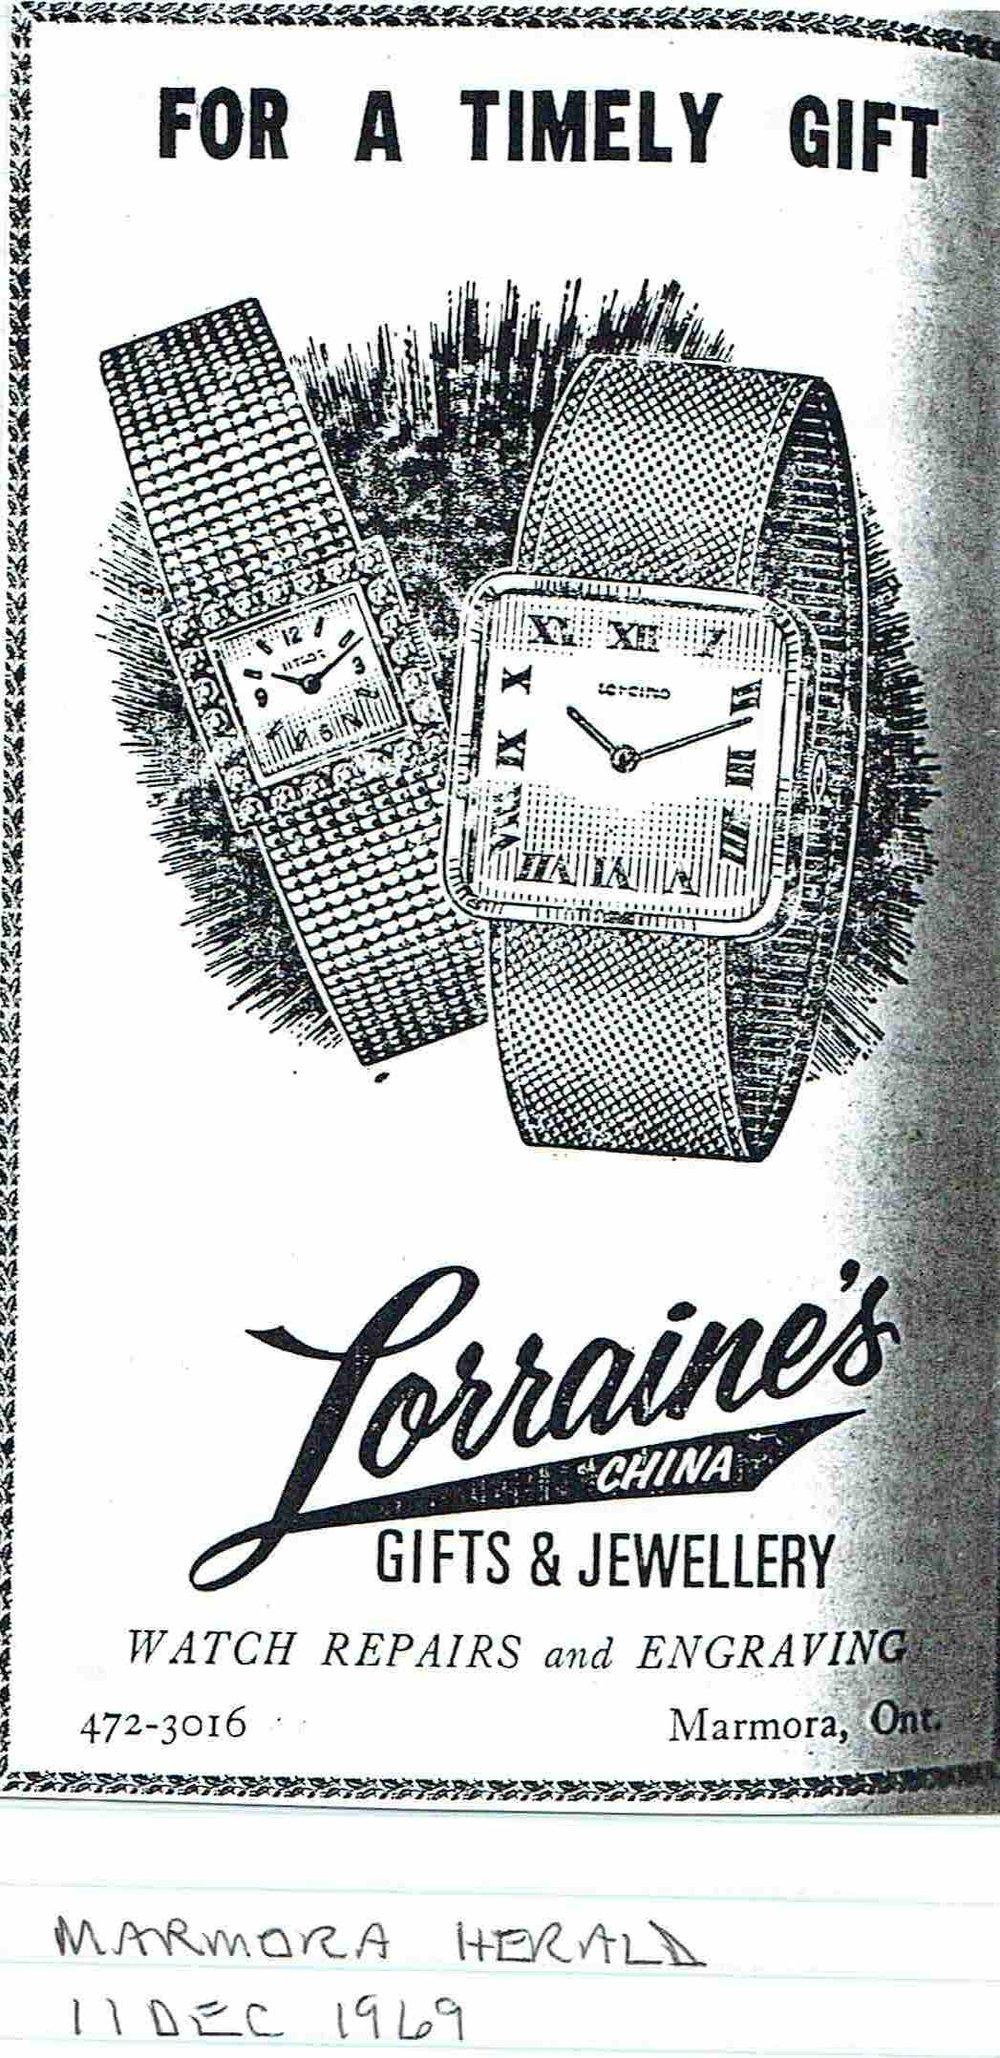 1969 Lorraines' Jewellery.JPG